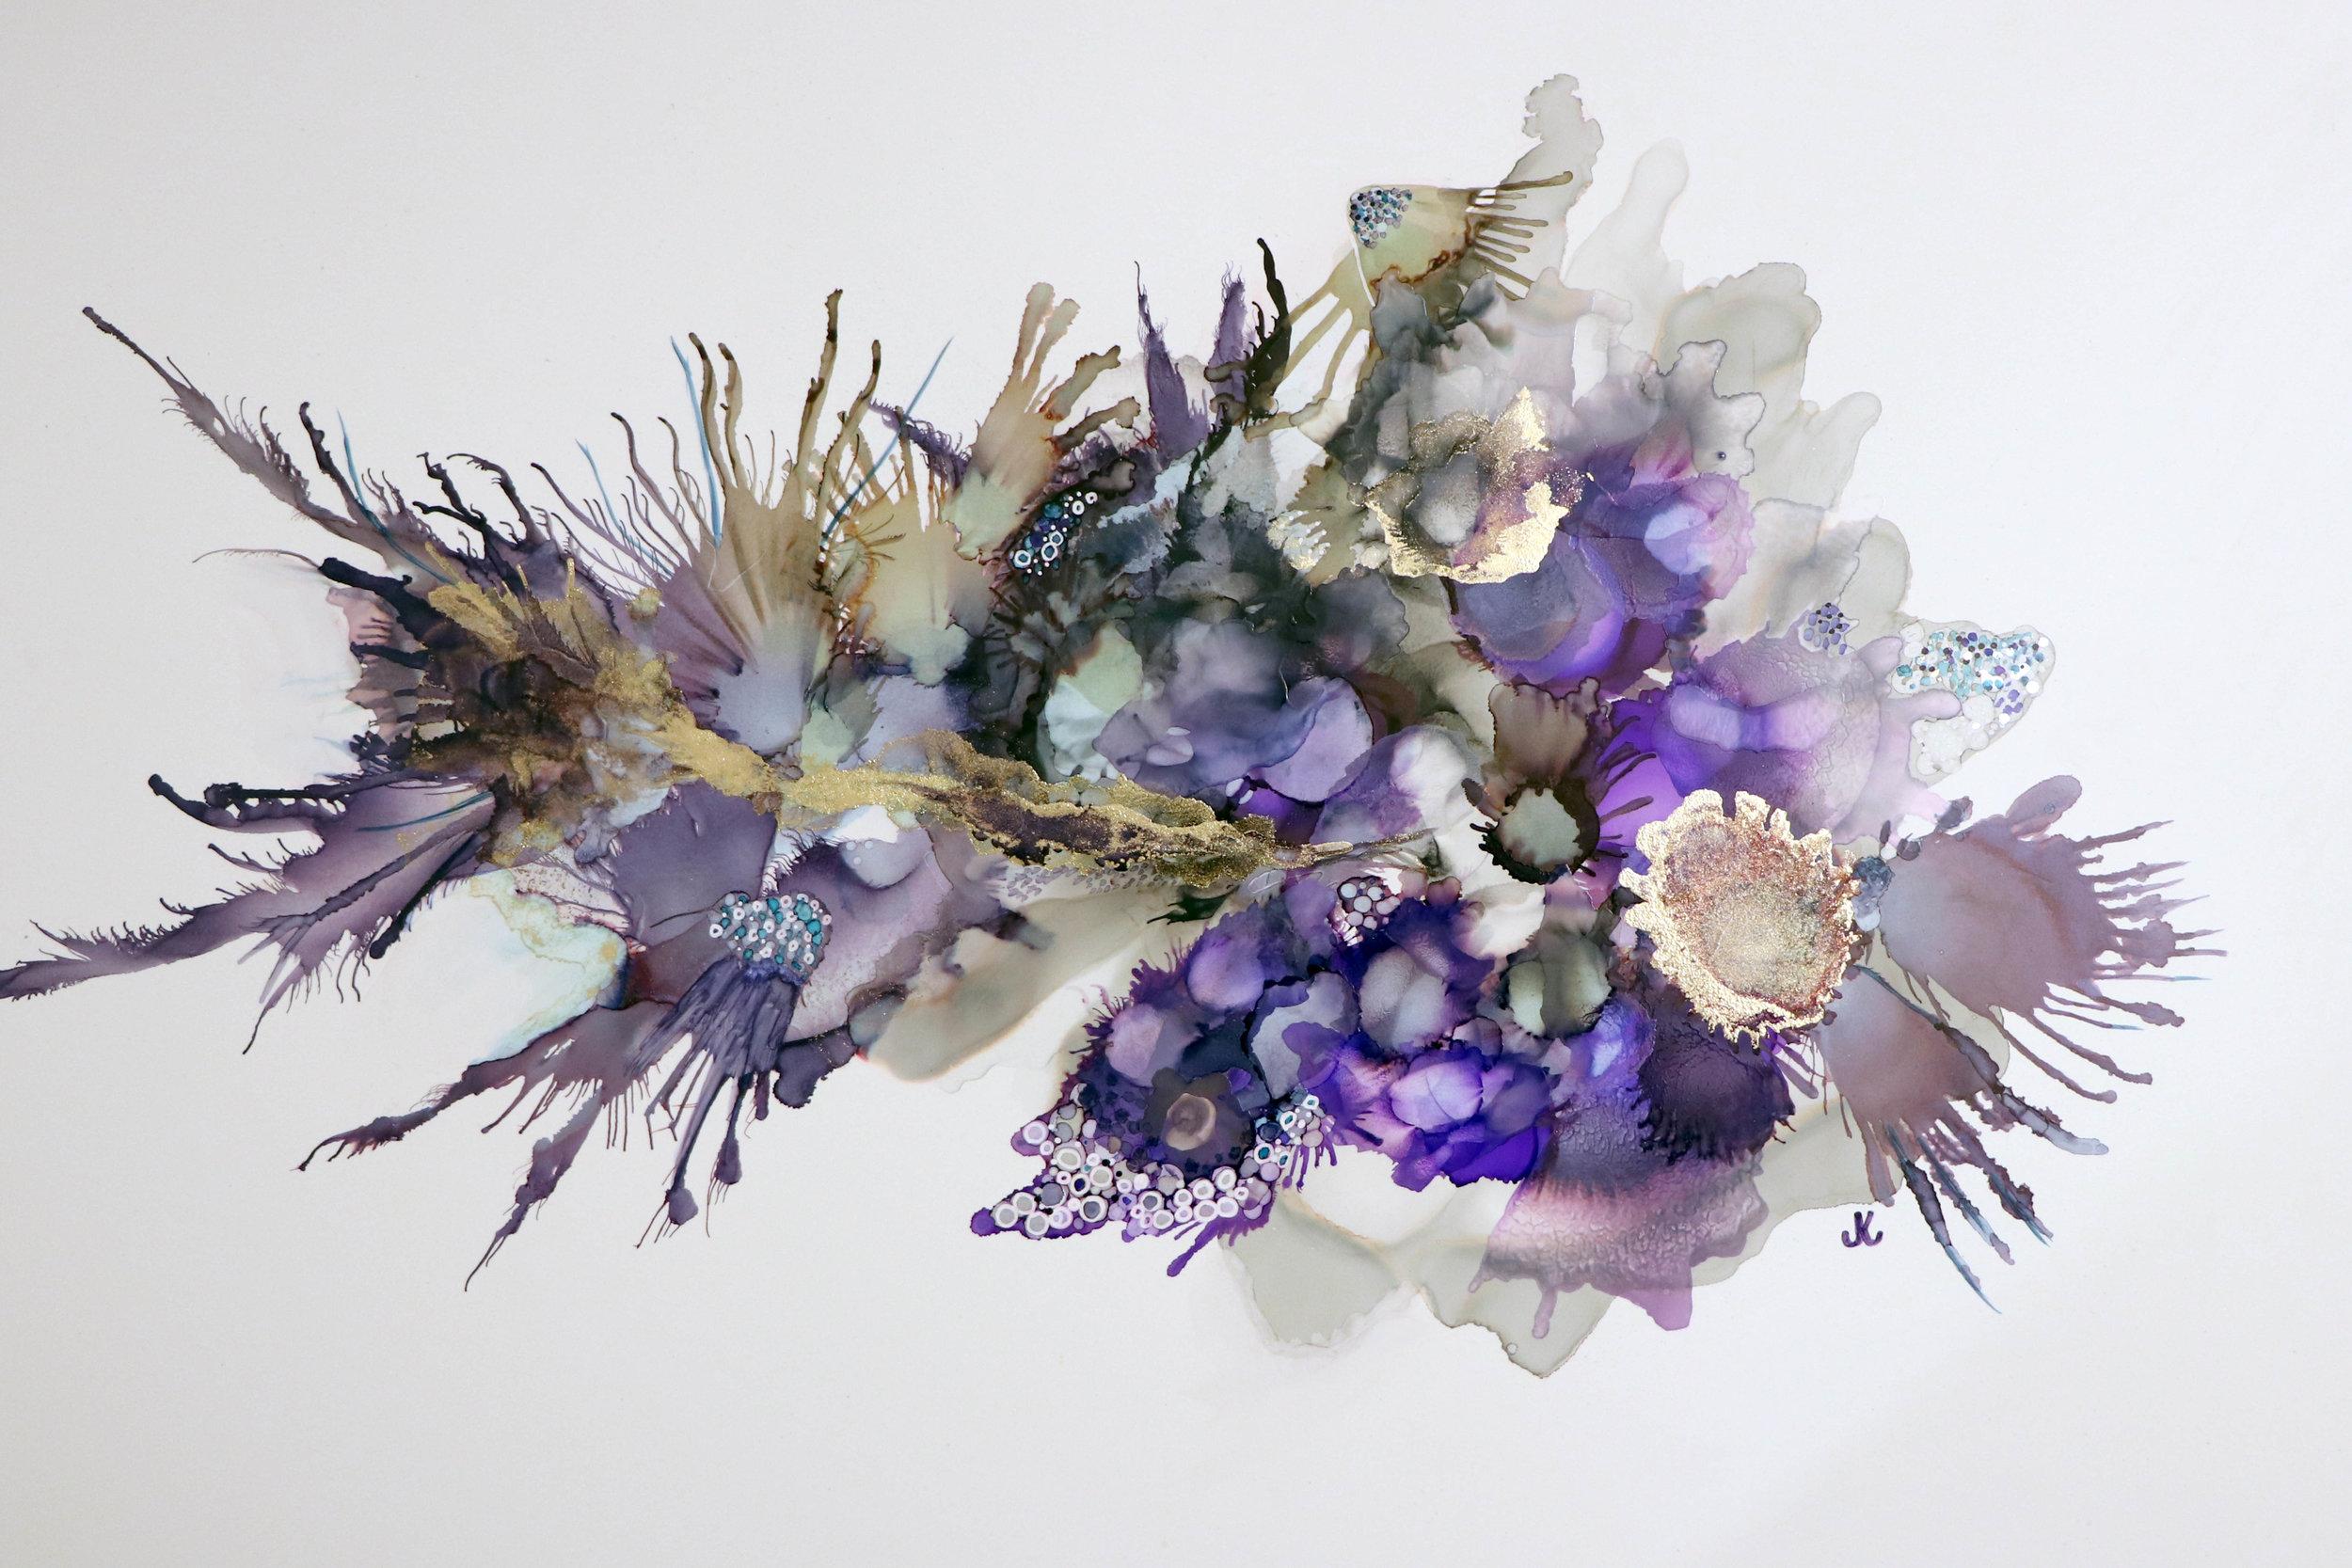 Artwork: 'Transcendence' by Janet Kvammen